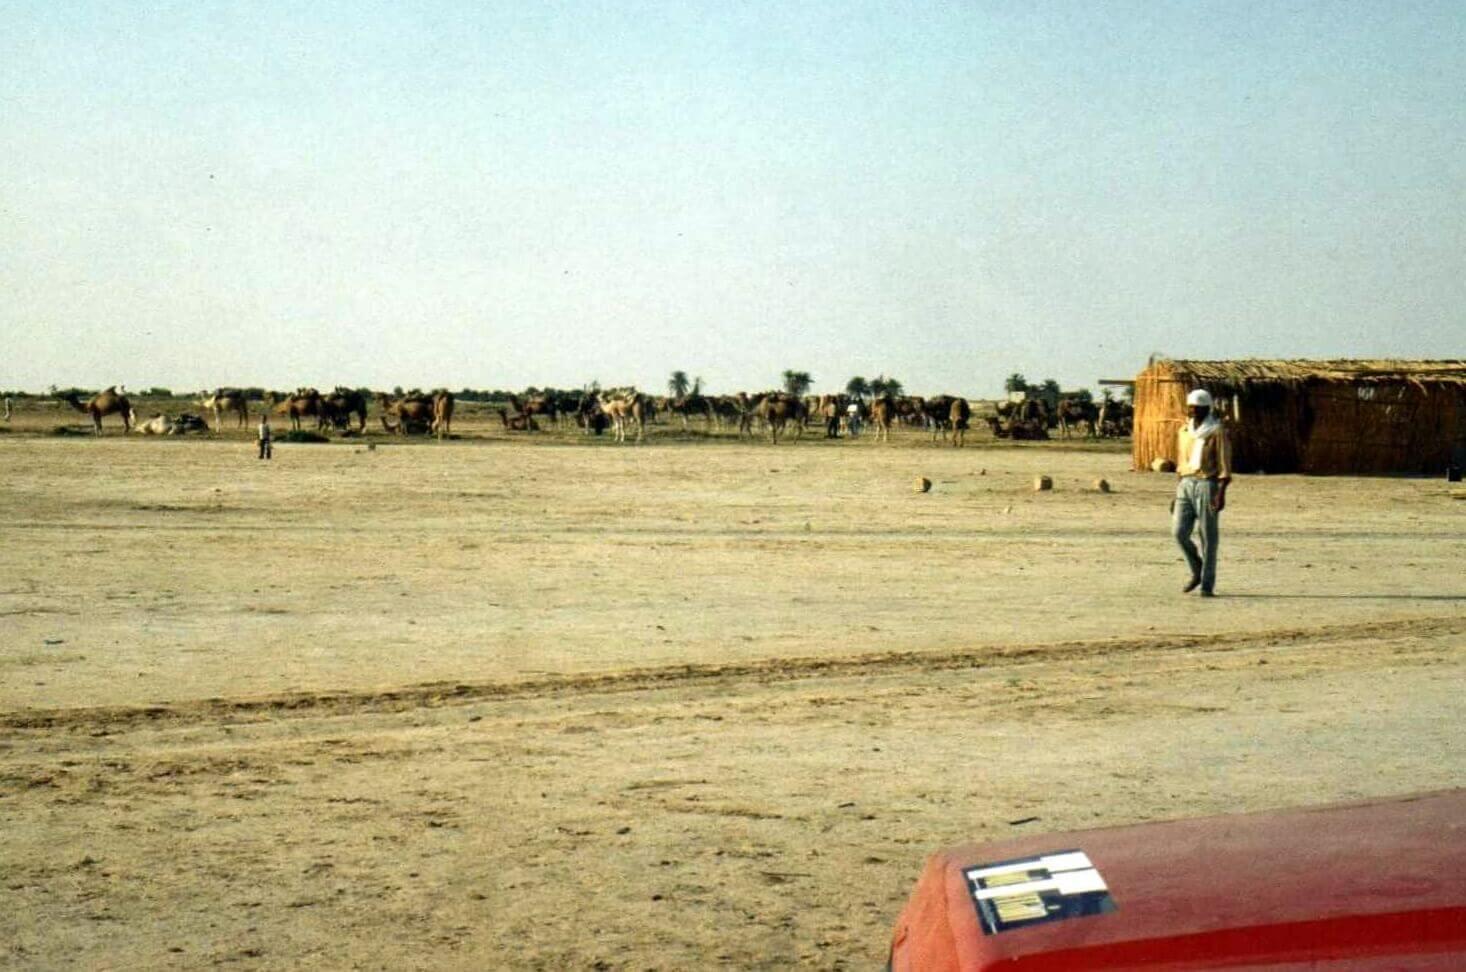 Raid moto 4x4 Tunisie Wild Spot Nefta El Faouar